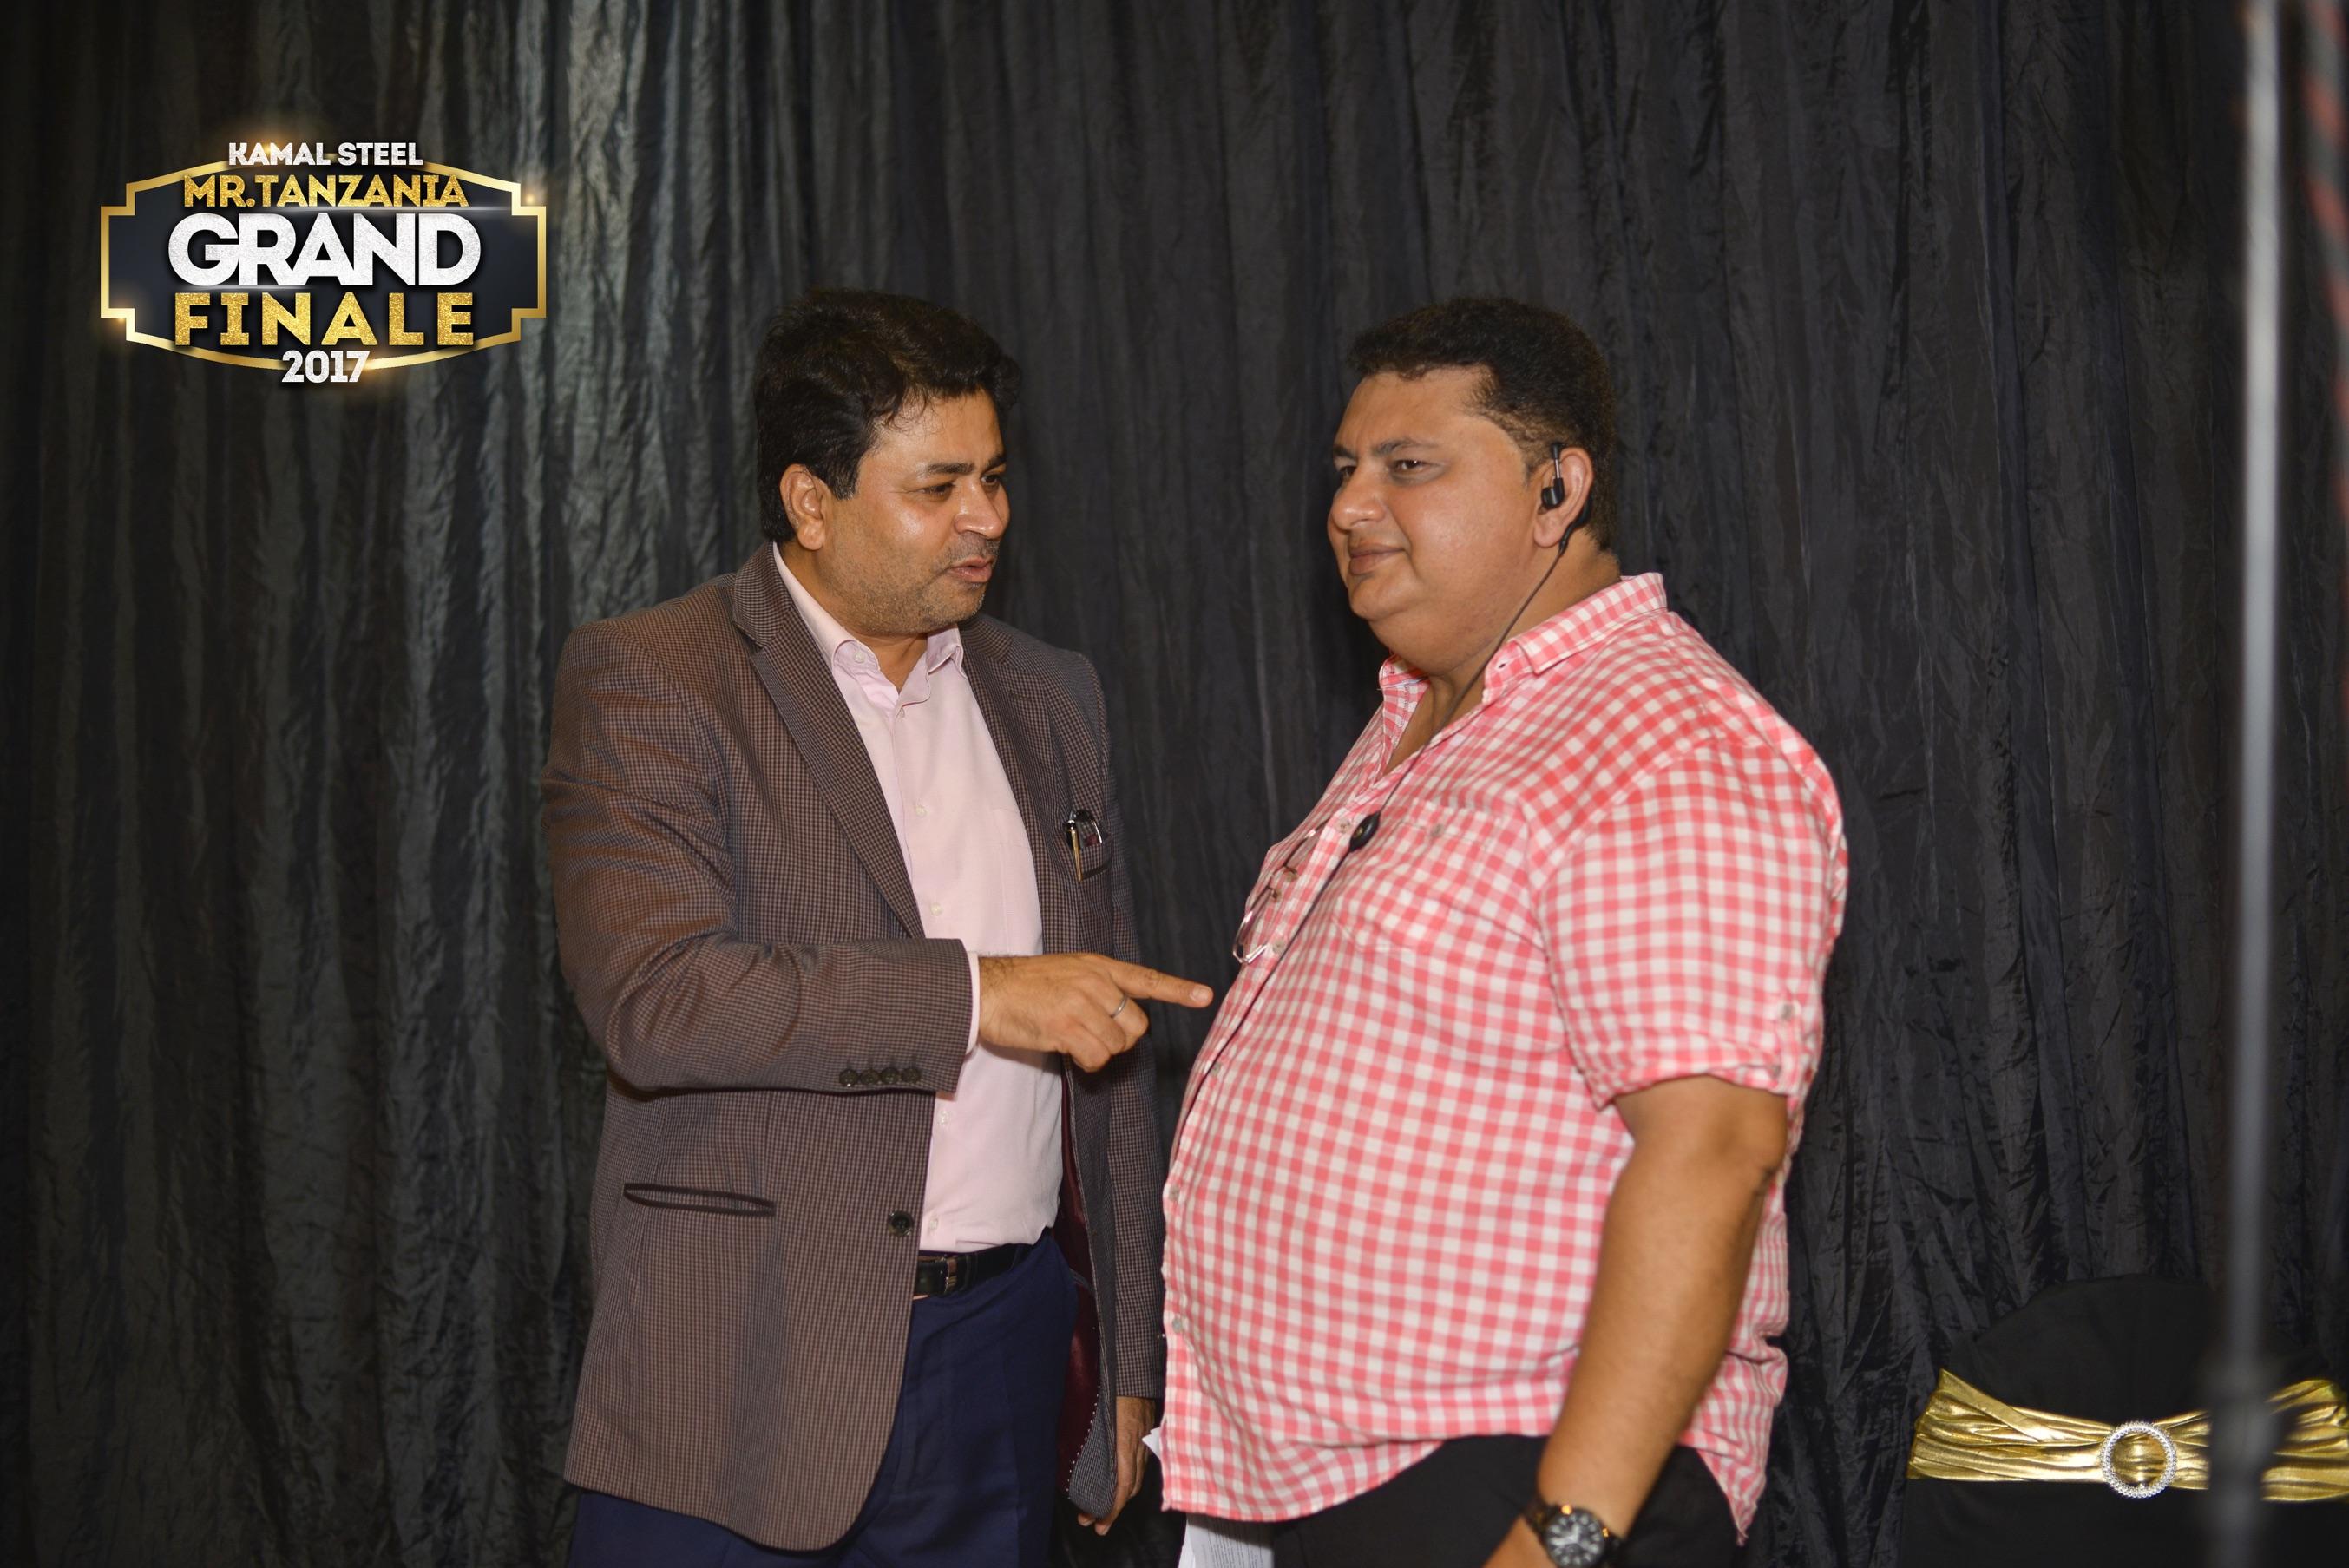 Mr. Gagan From Kamal Steel with Mr. Nilesh Bhatt